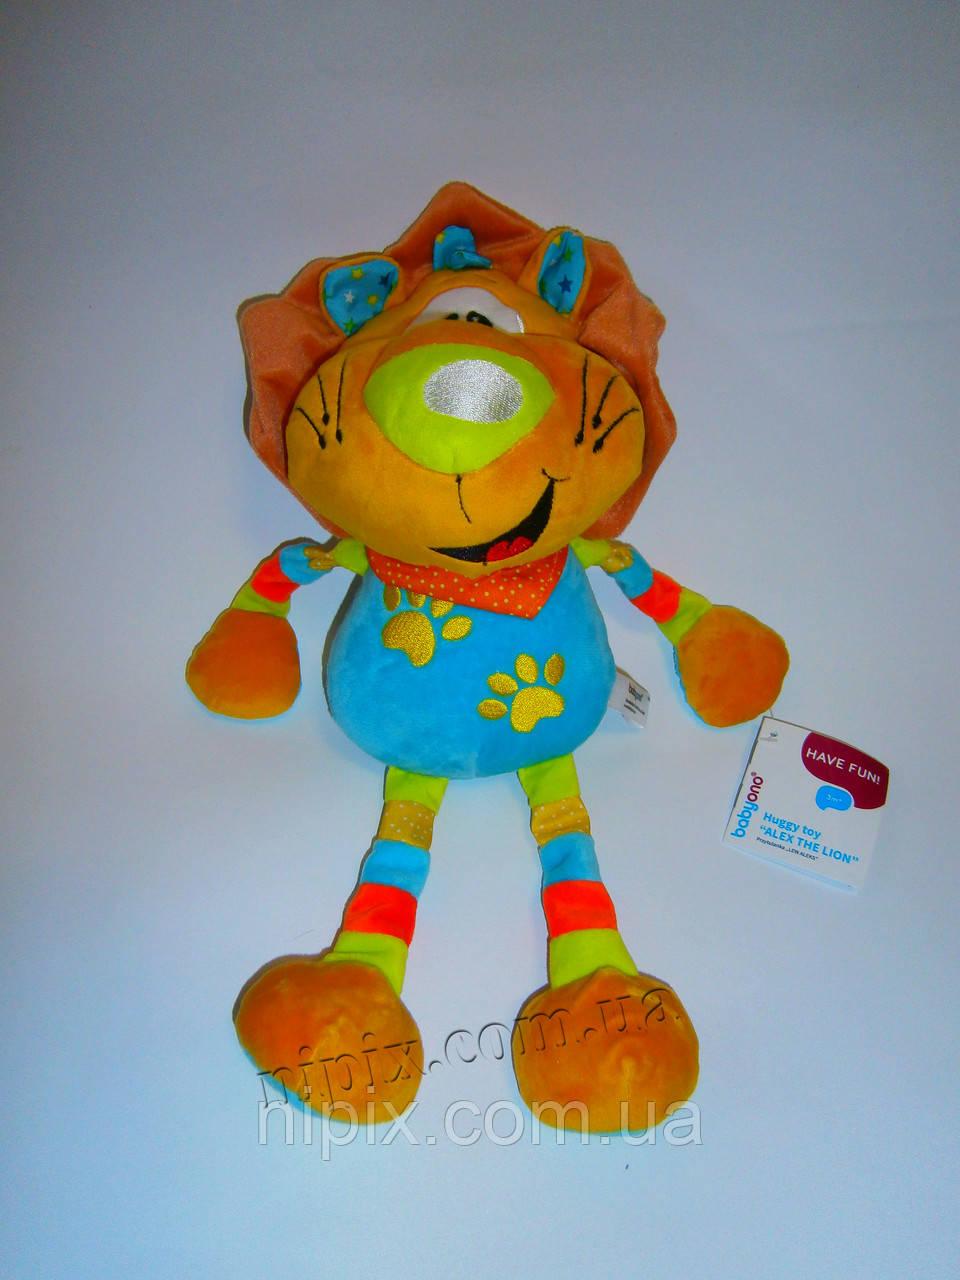 Мягкая игрушка-обнимашка Лев